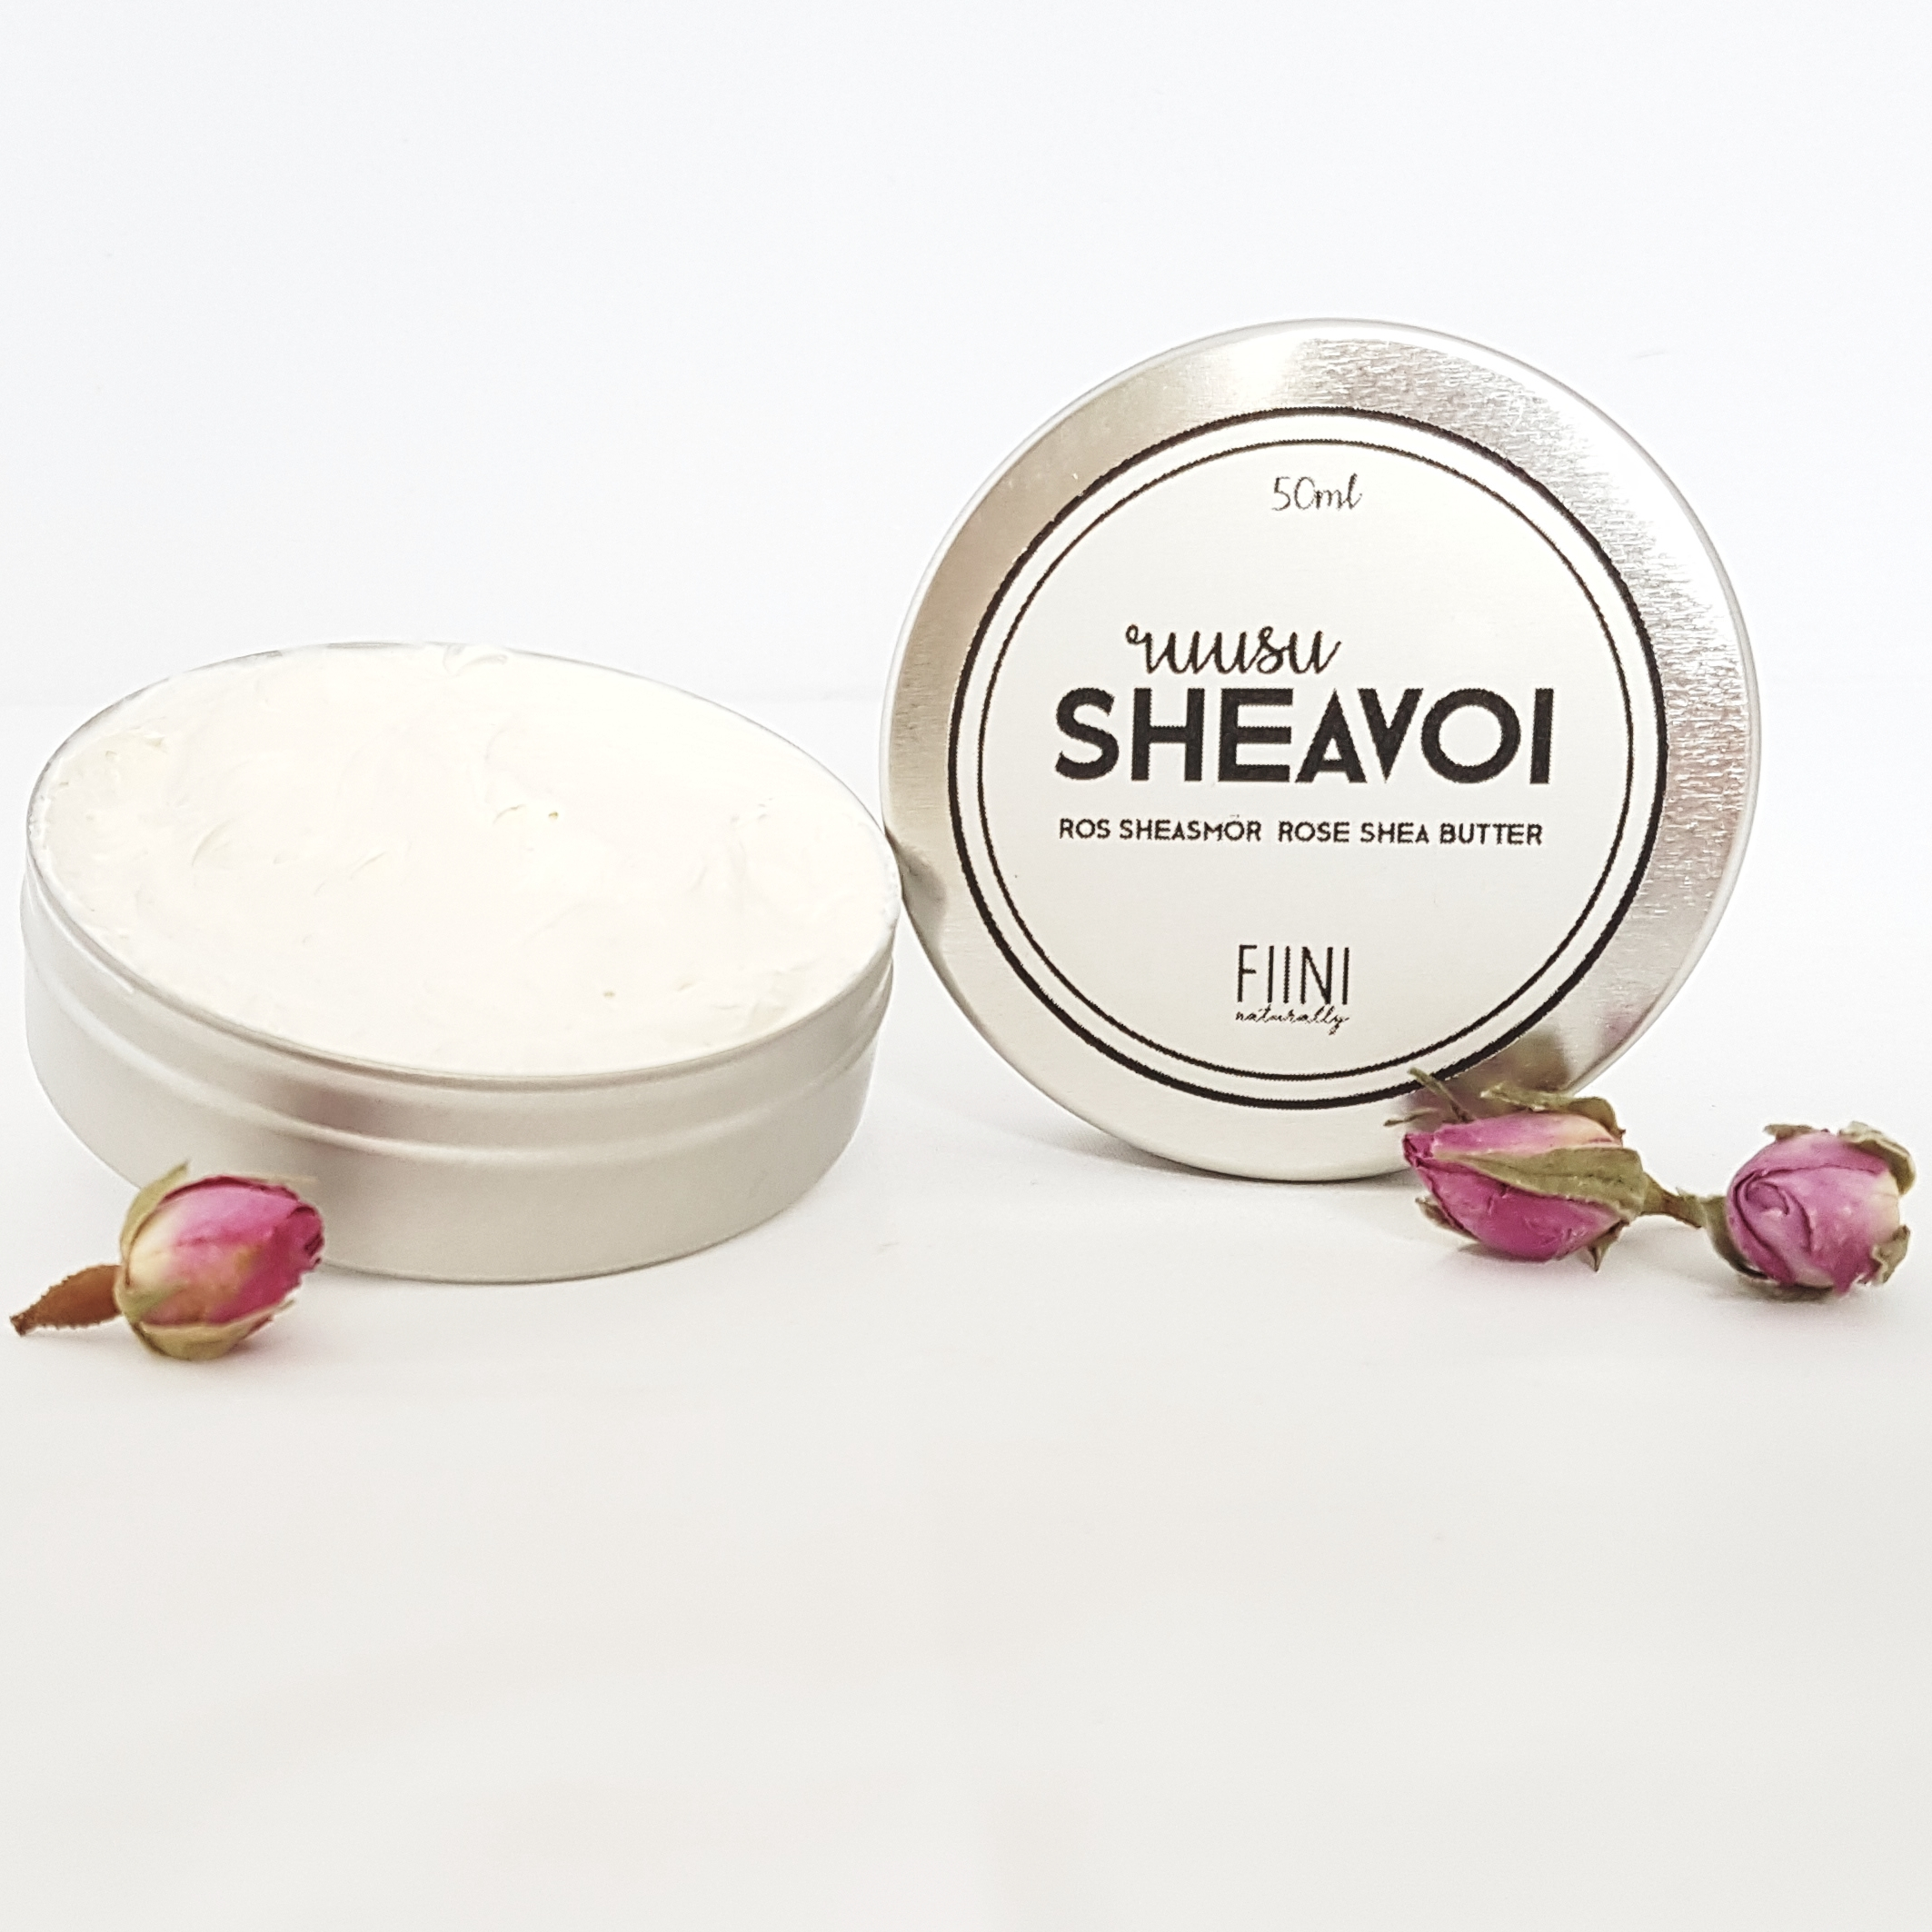 Fiini Naturally ruusu-sheavoi, 50ml